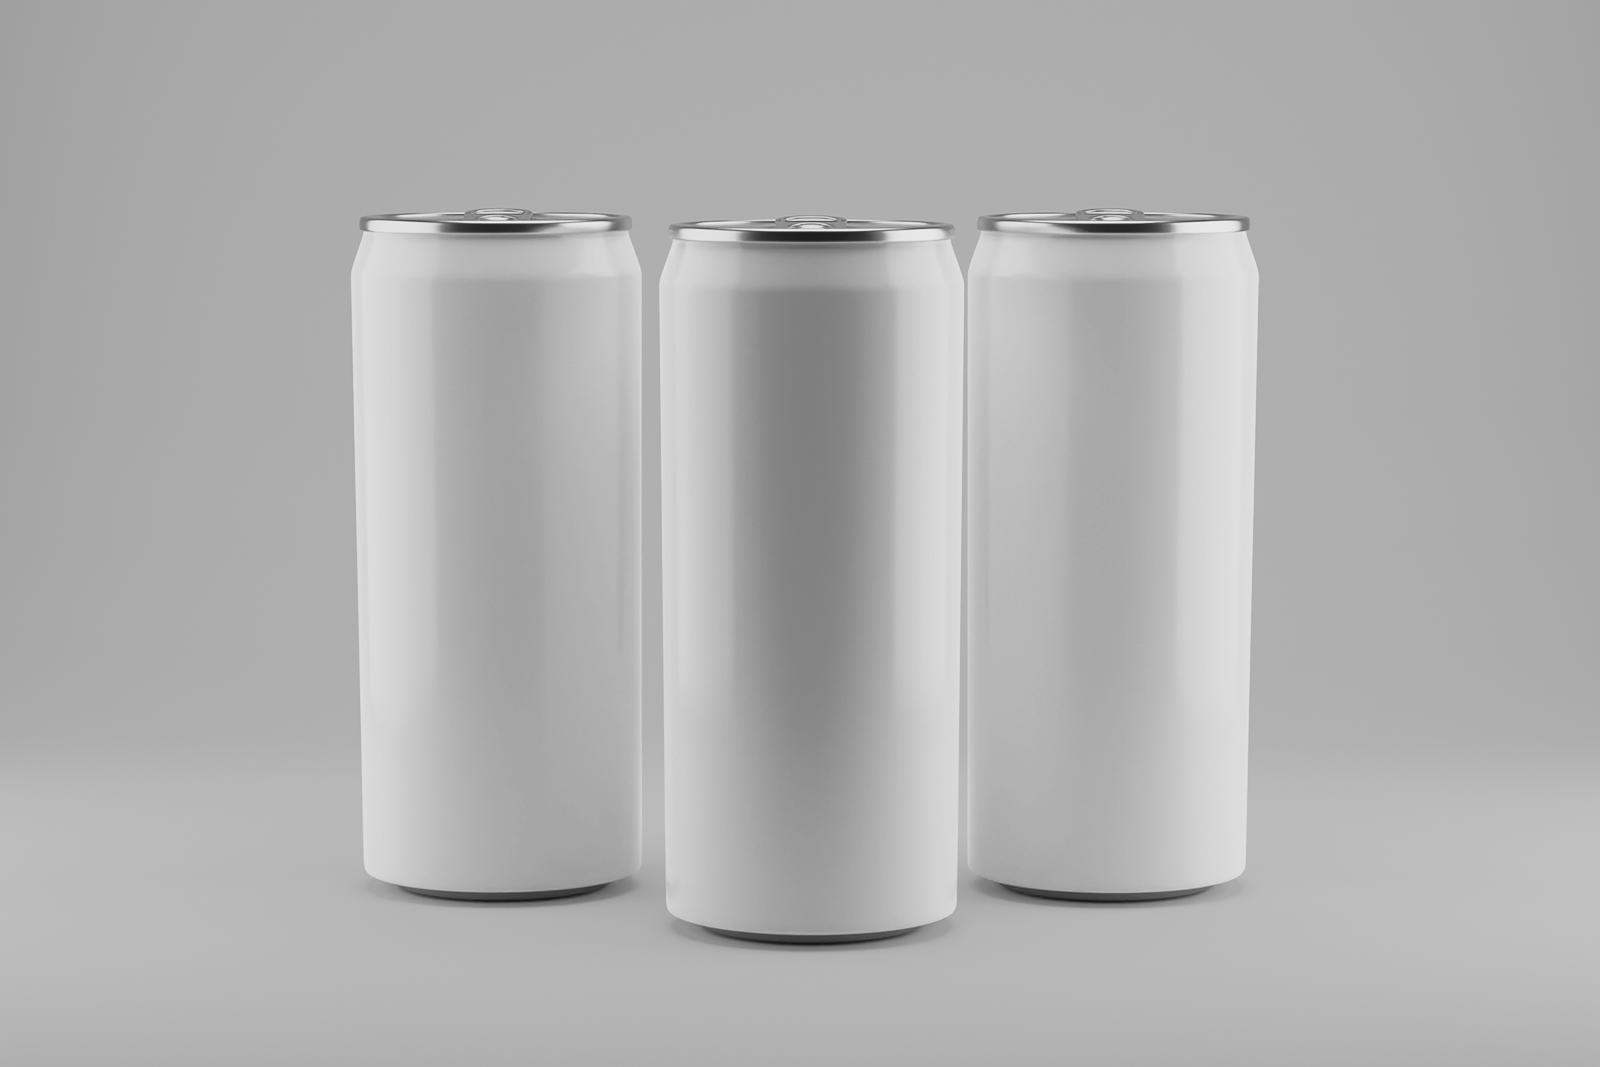 Free Aluminum Cans Mockup